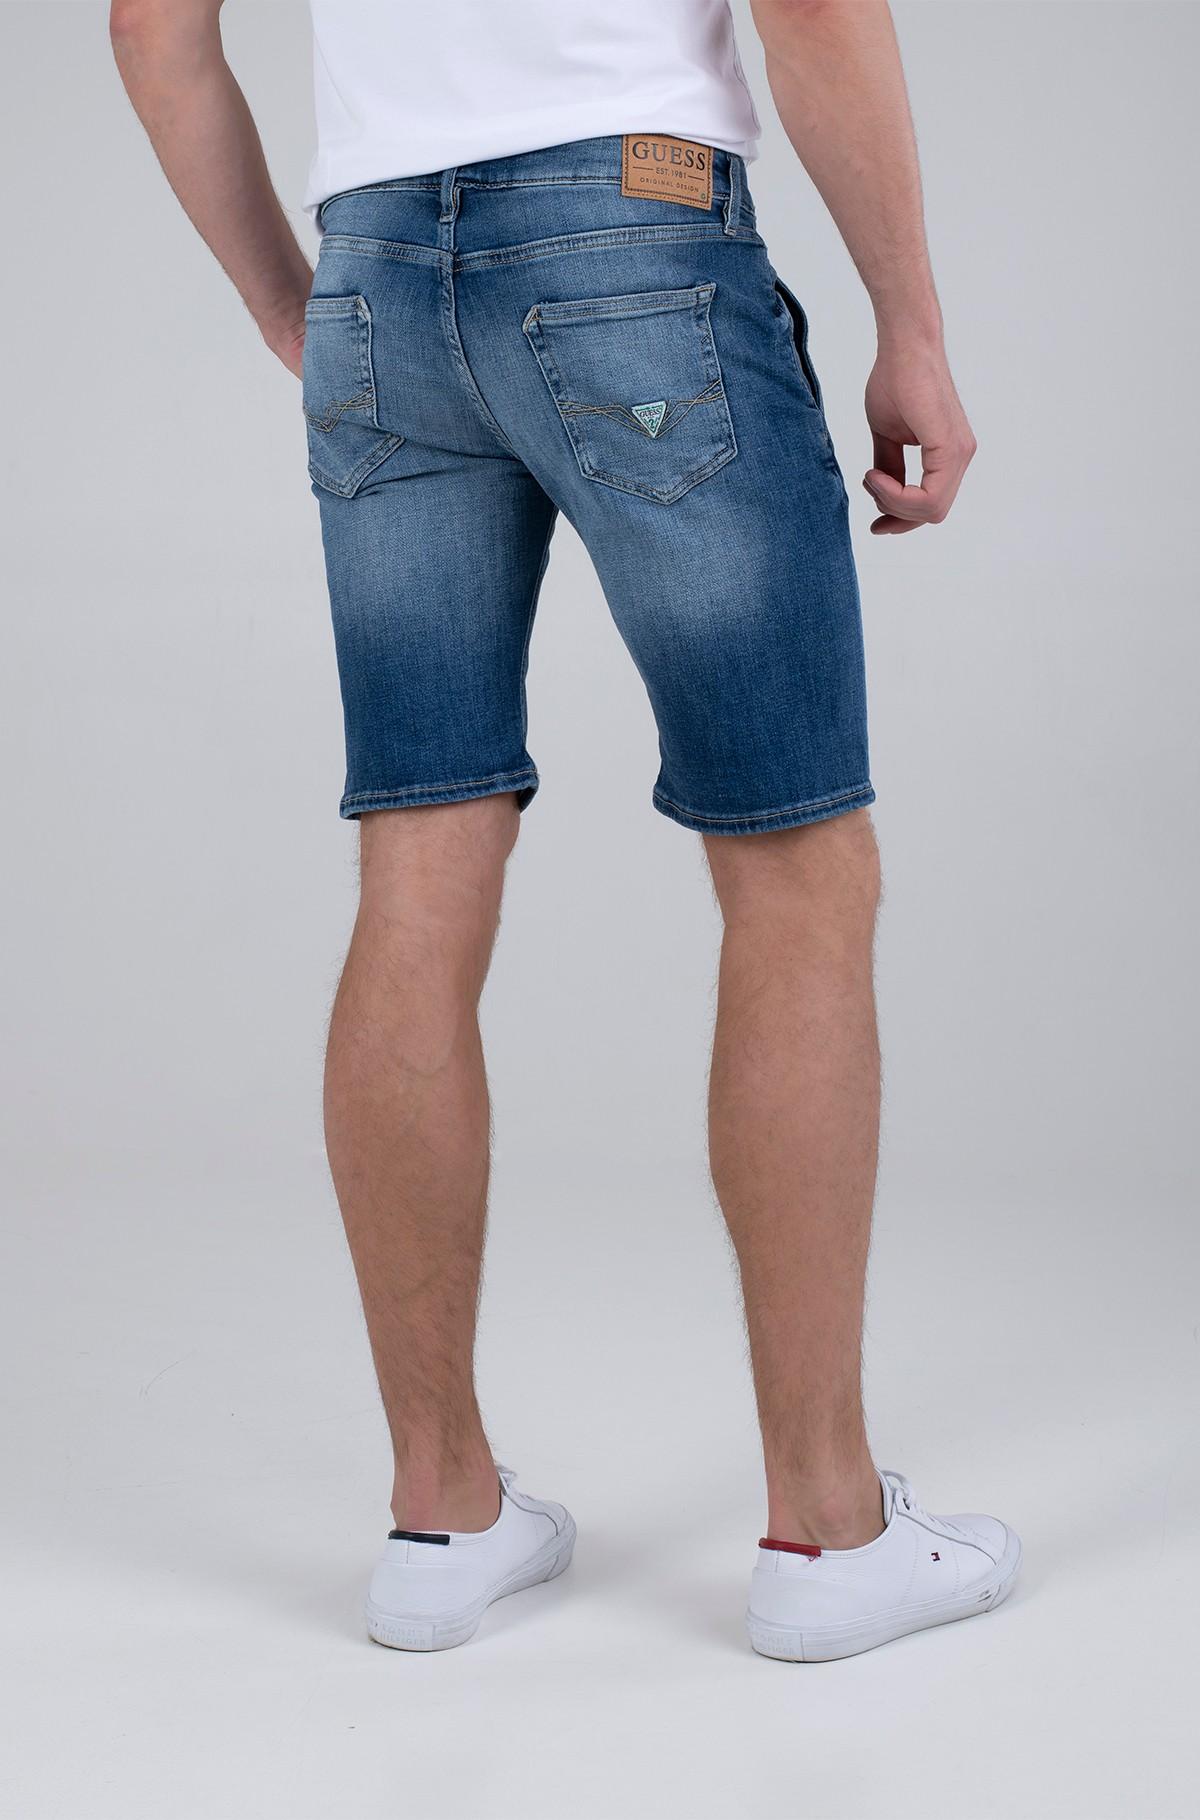 Shorts M1GD04 D4B71-full-2